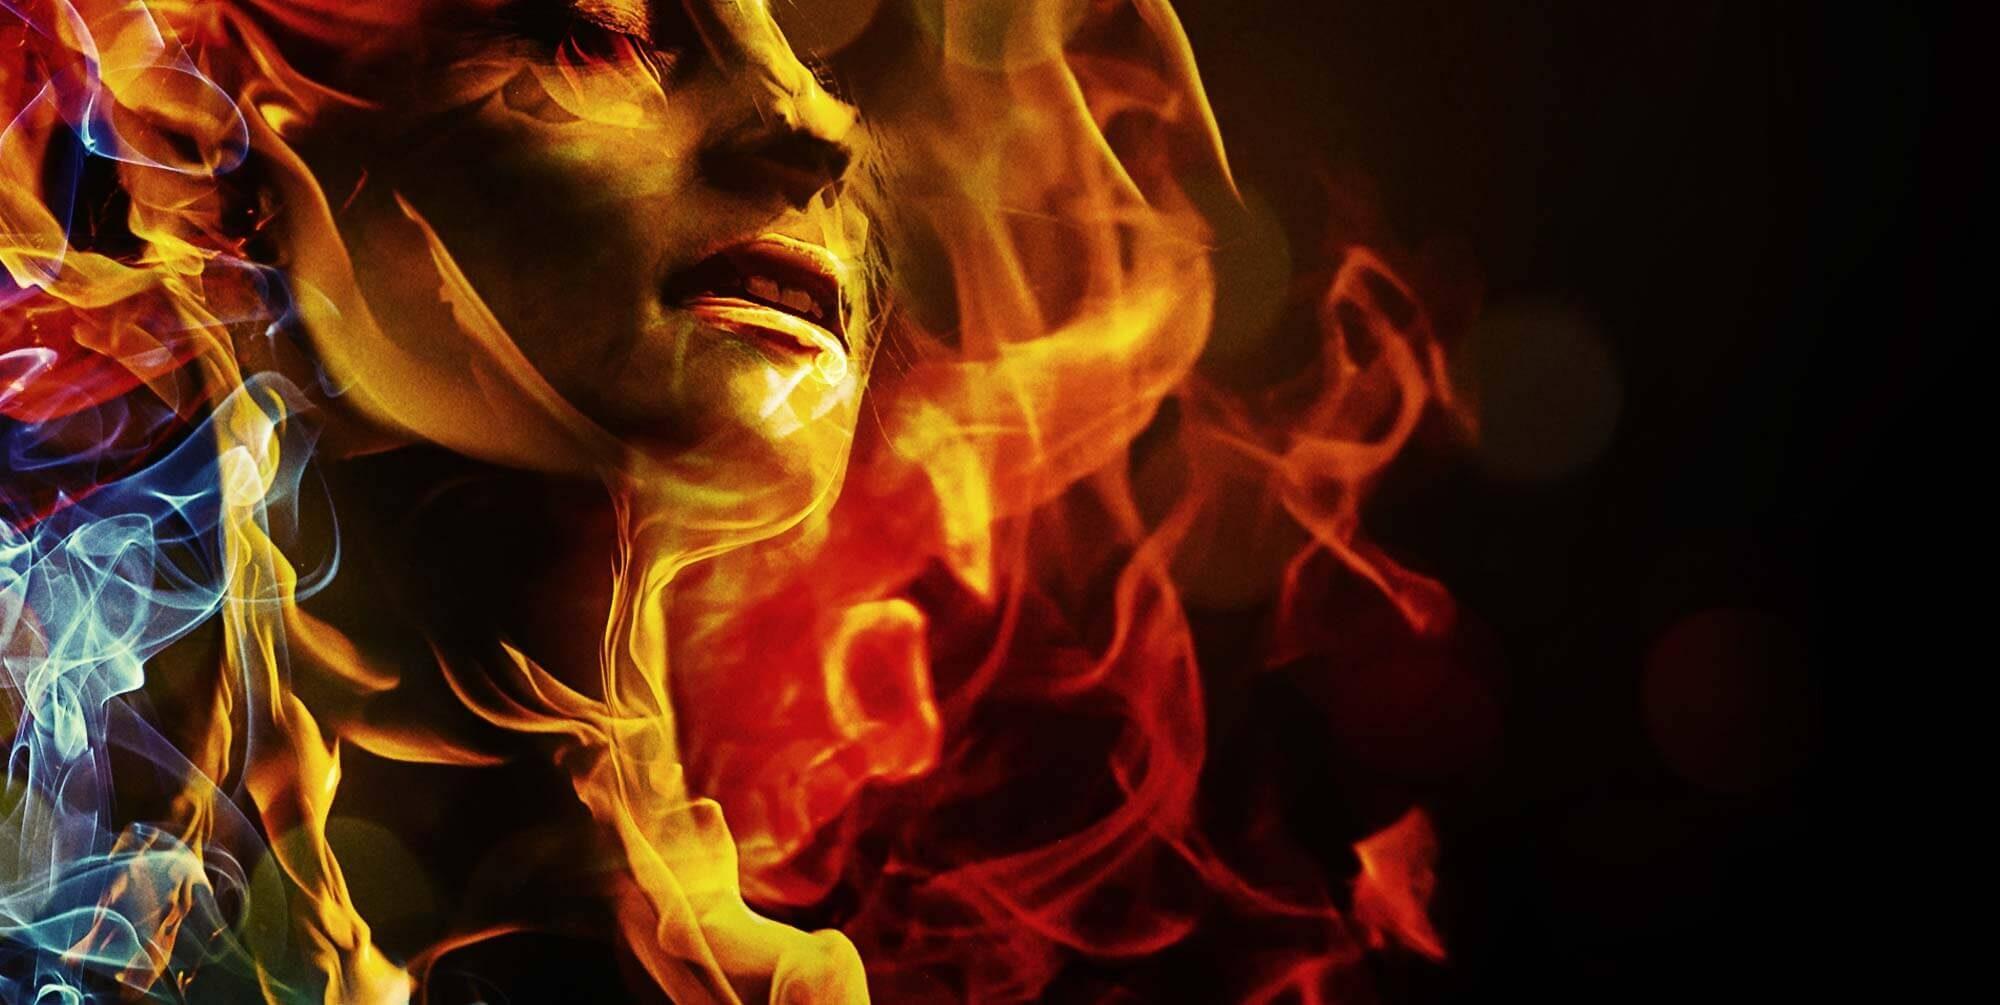 SNW-Website-True-Passions-Burn-Brighter-2000x1005